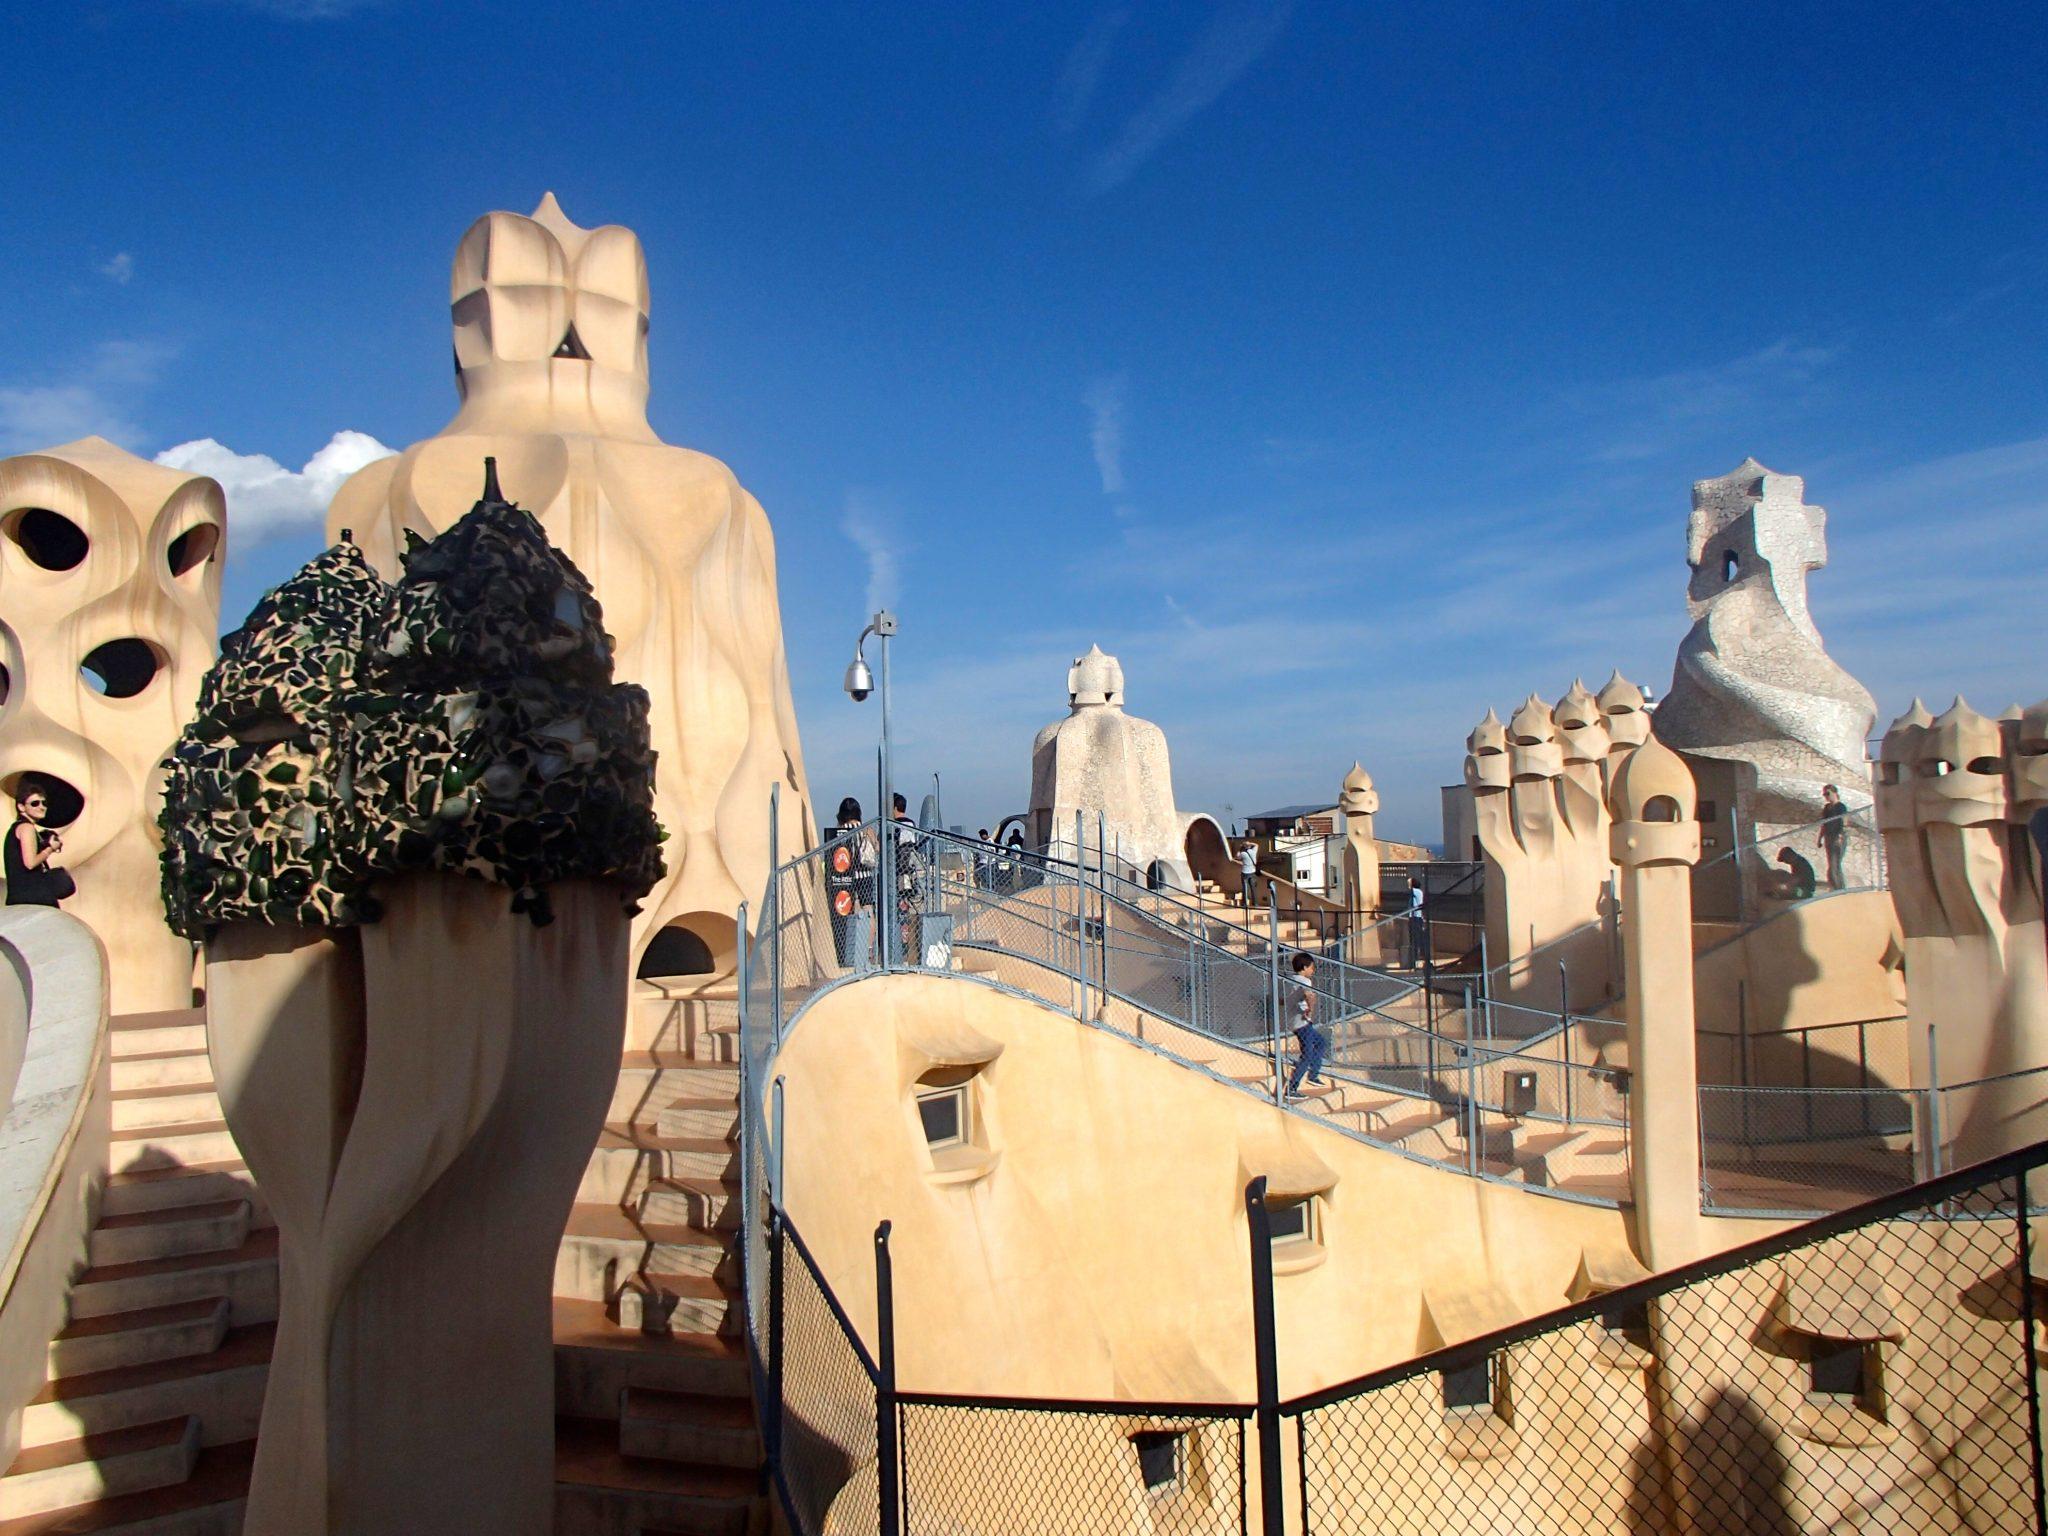 La Pedrera rooftop cava tapas